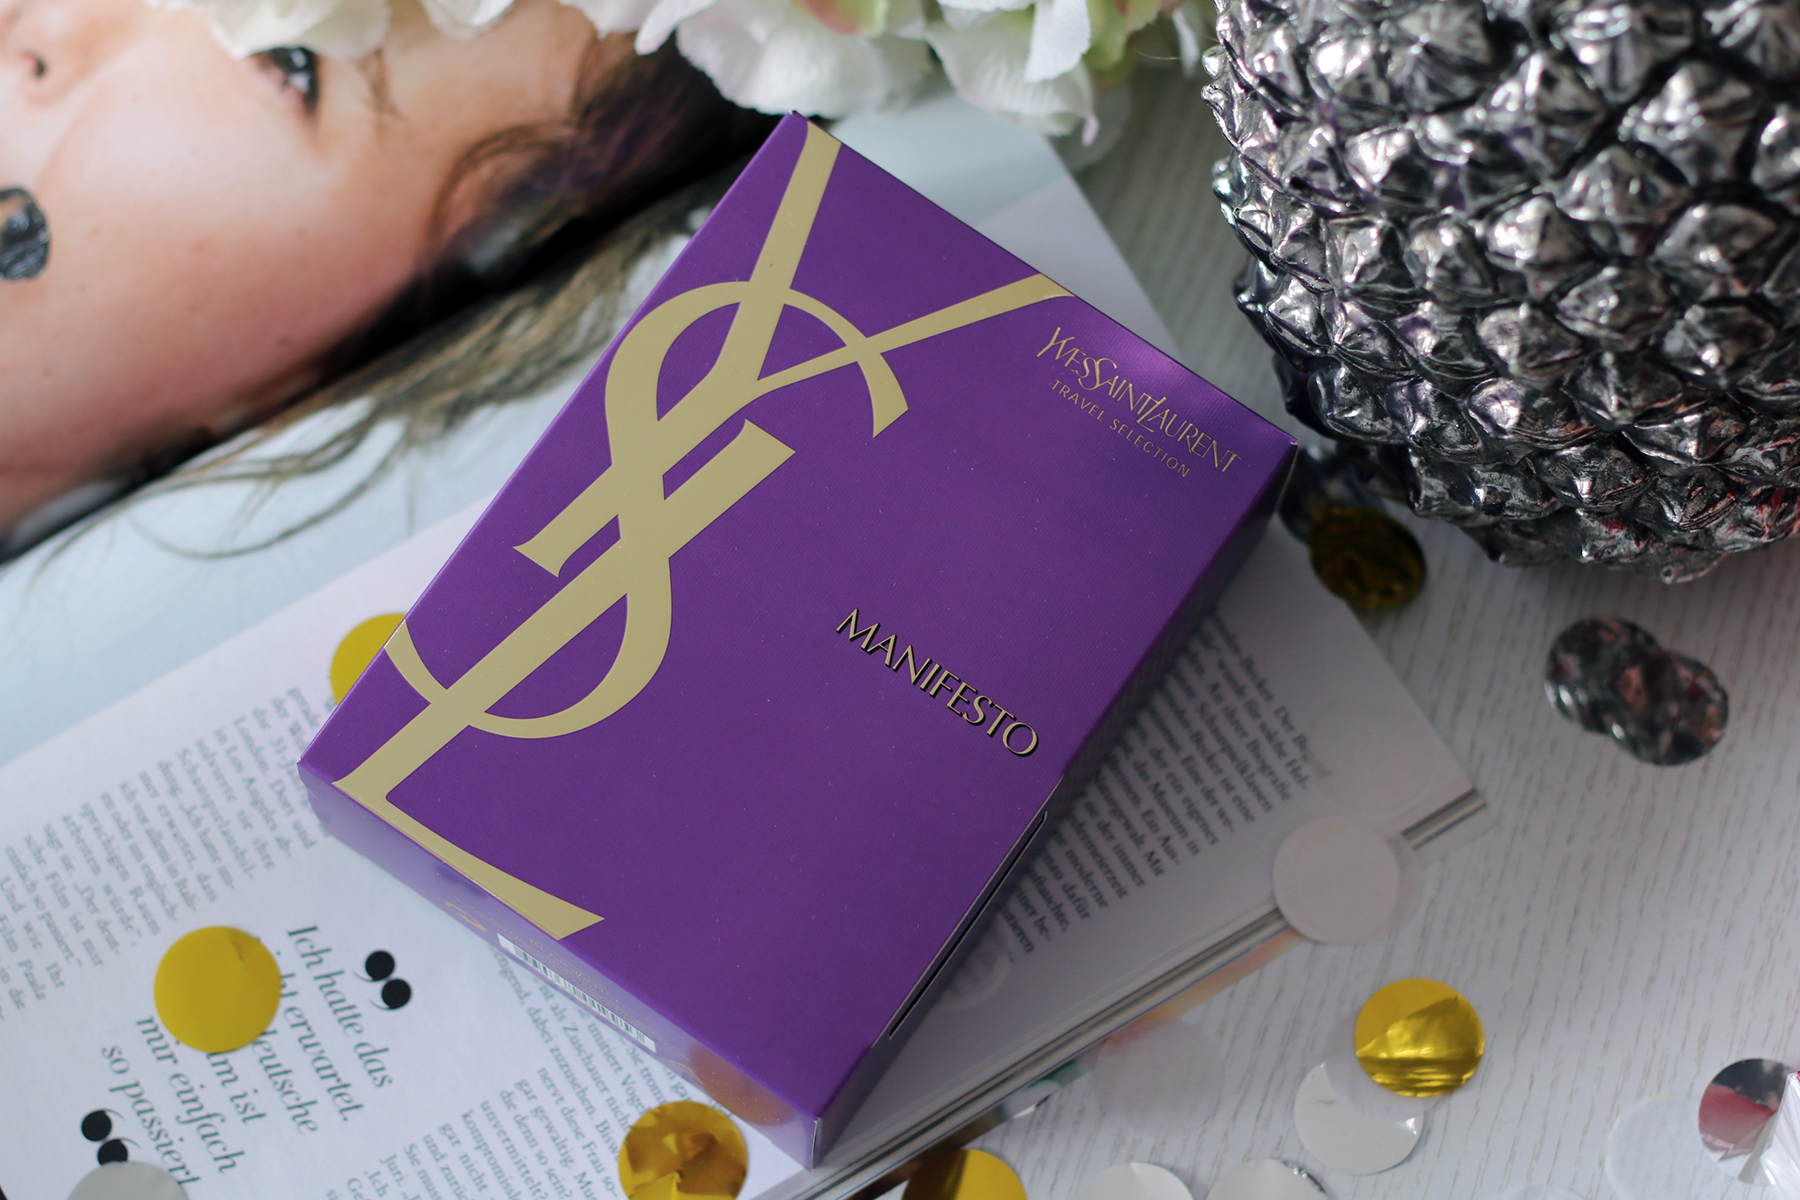 duty-free-shop-düsseldorf-worlddutyfree-yves-saint-laurent-parfüm-manifesto-beautyblog2